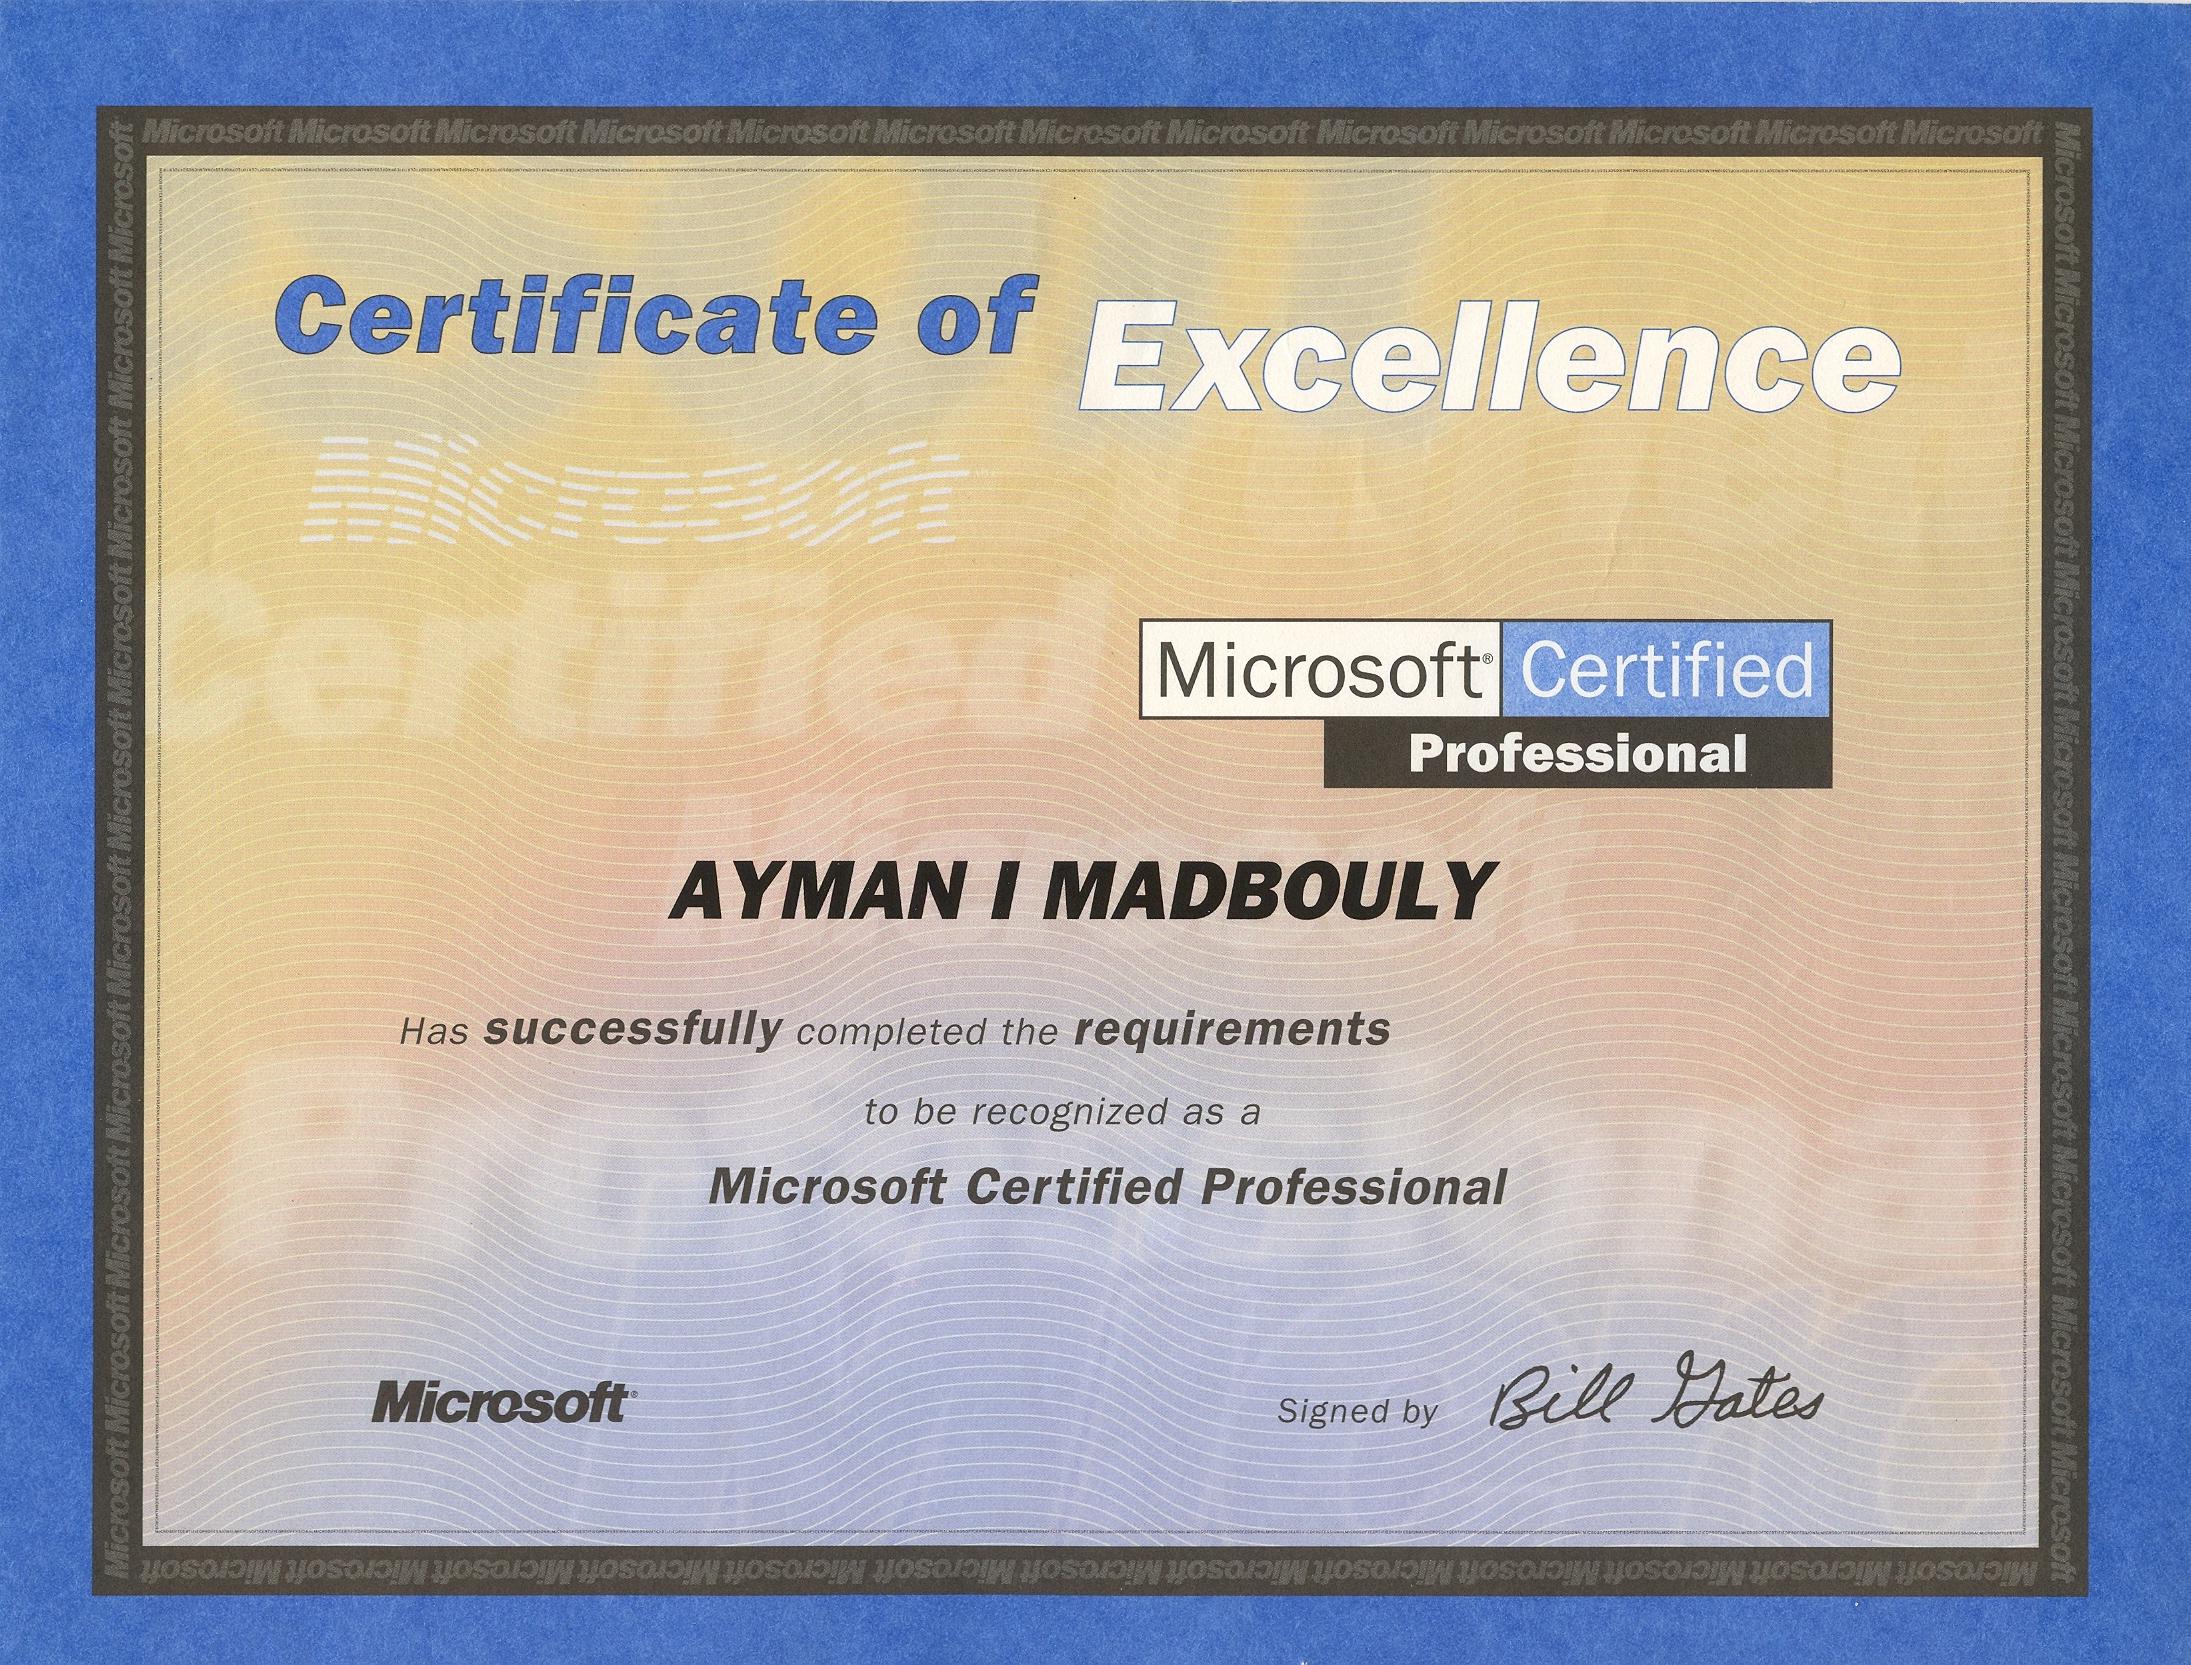 ayman i madbouly khalil photo album microsoft certificates